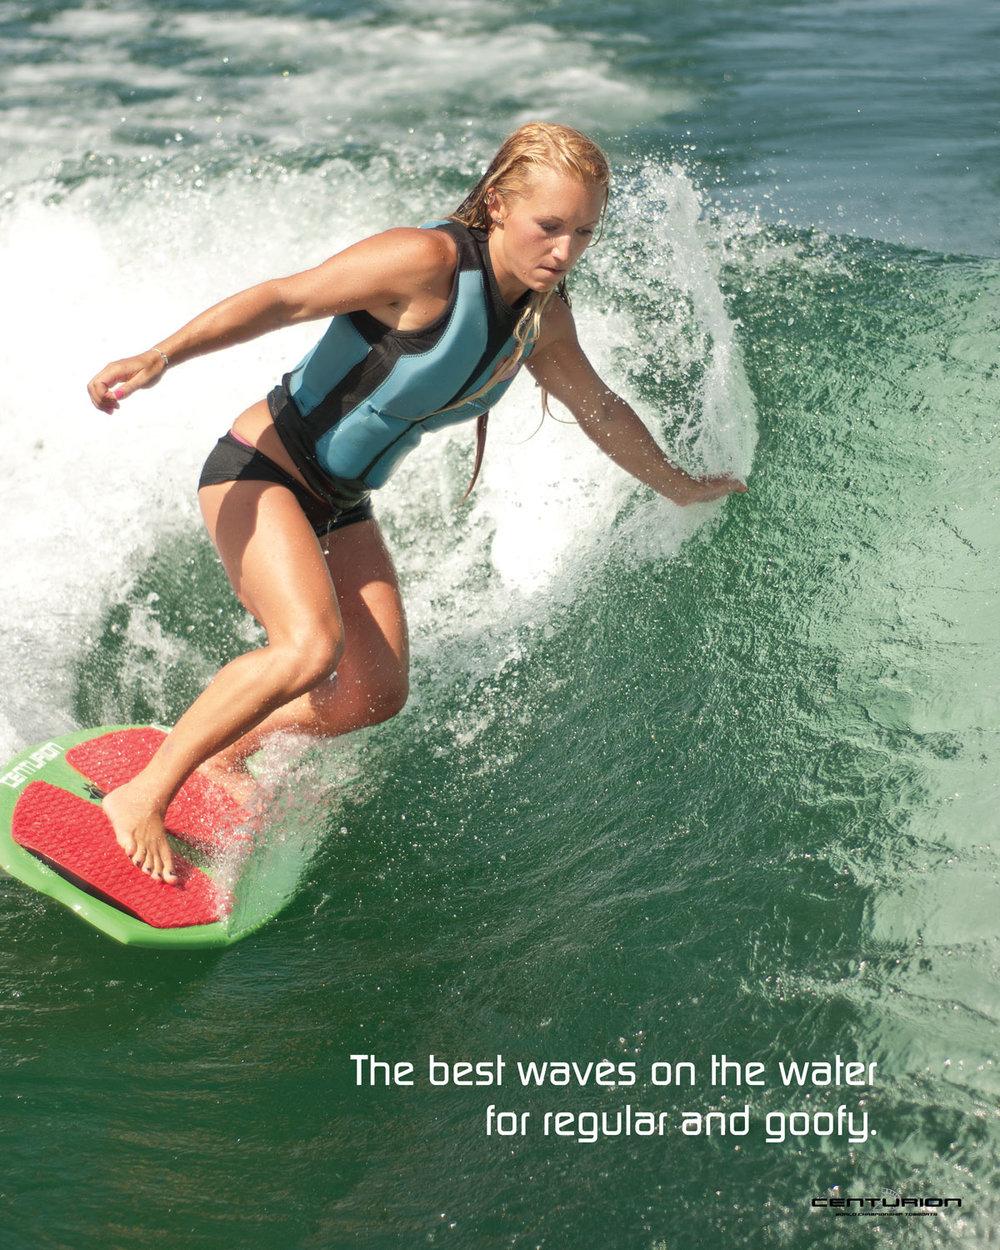 wakesurf-1.jpg